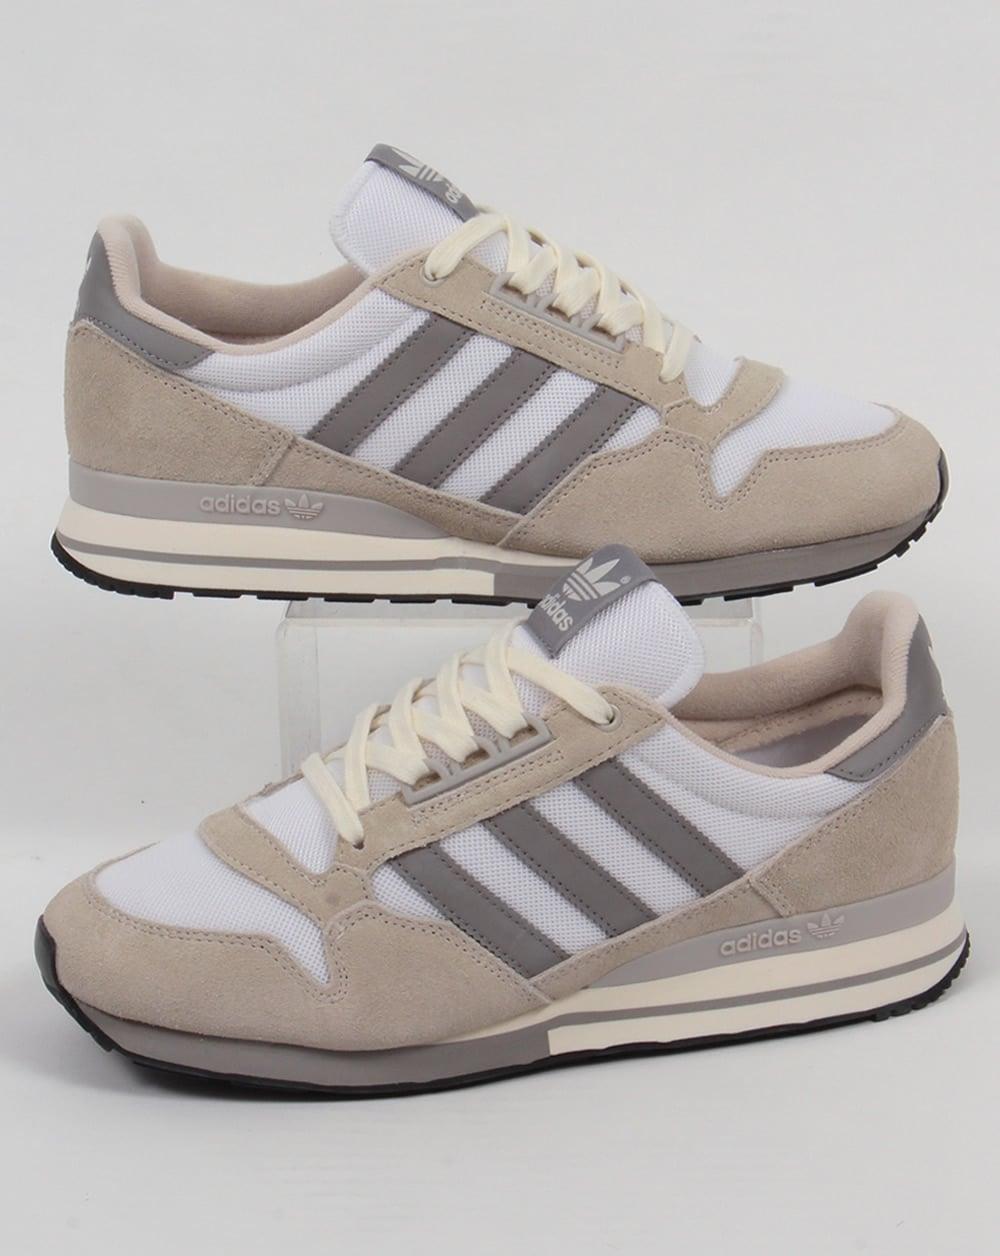 adidas zx 500 og trainers white light onix originals shoes. Black Bedroom Furniture Sets. Home Design Ideas